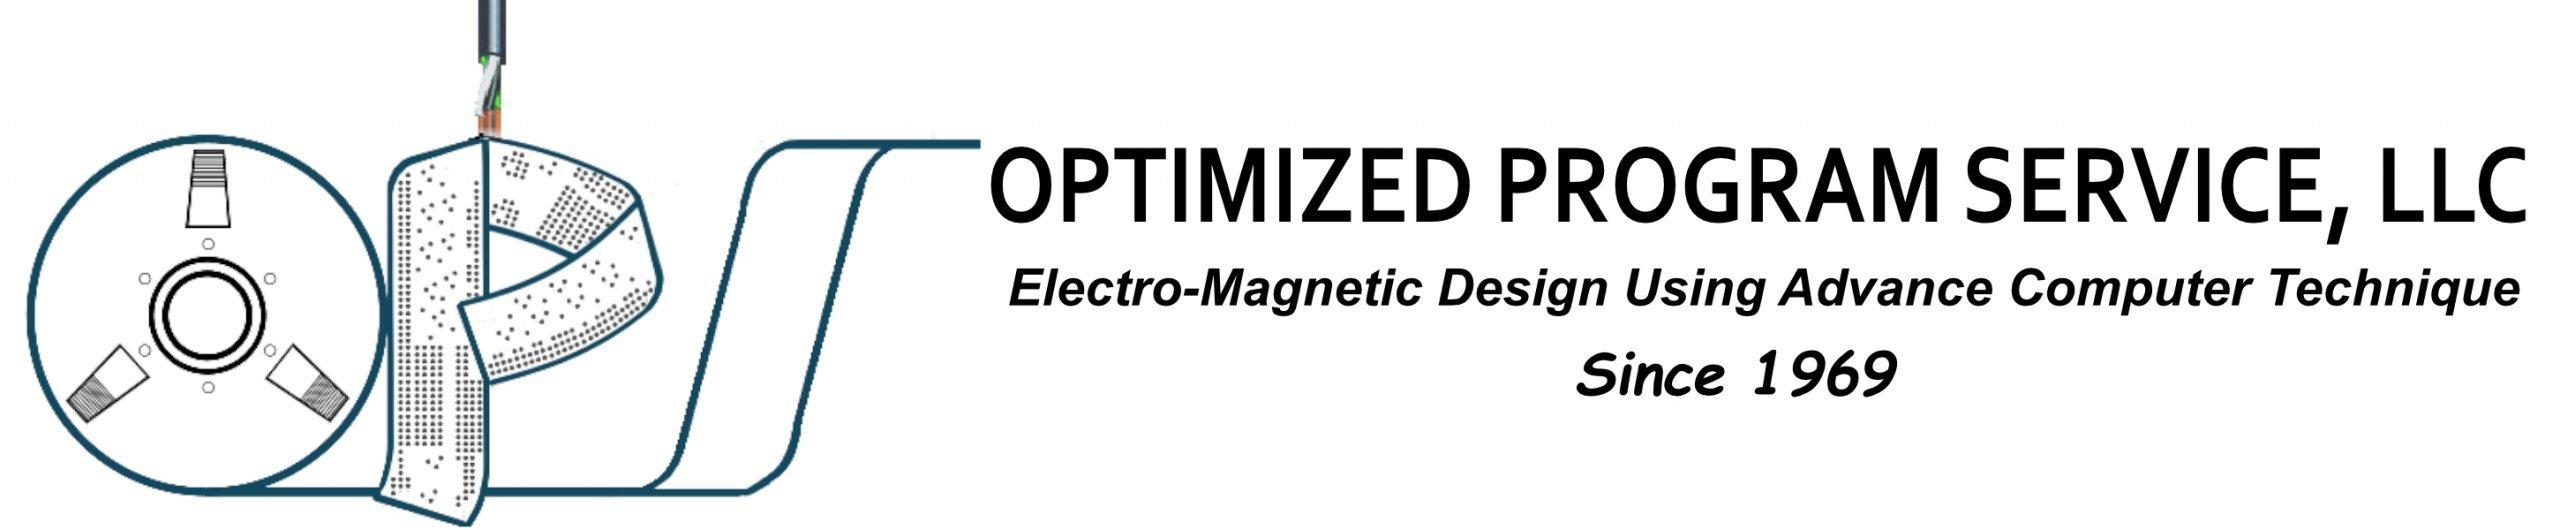 Optimized Program Service LLC